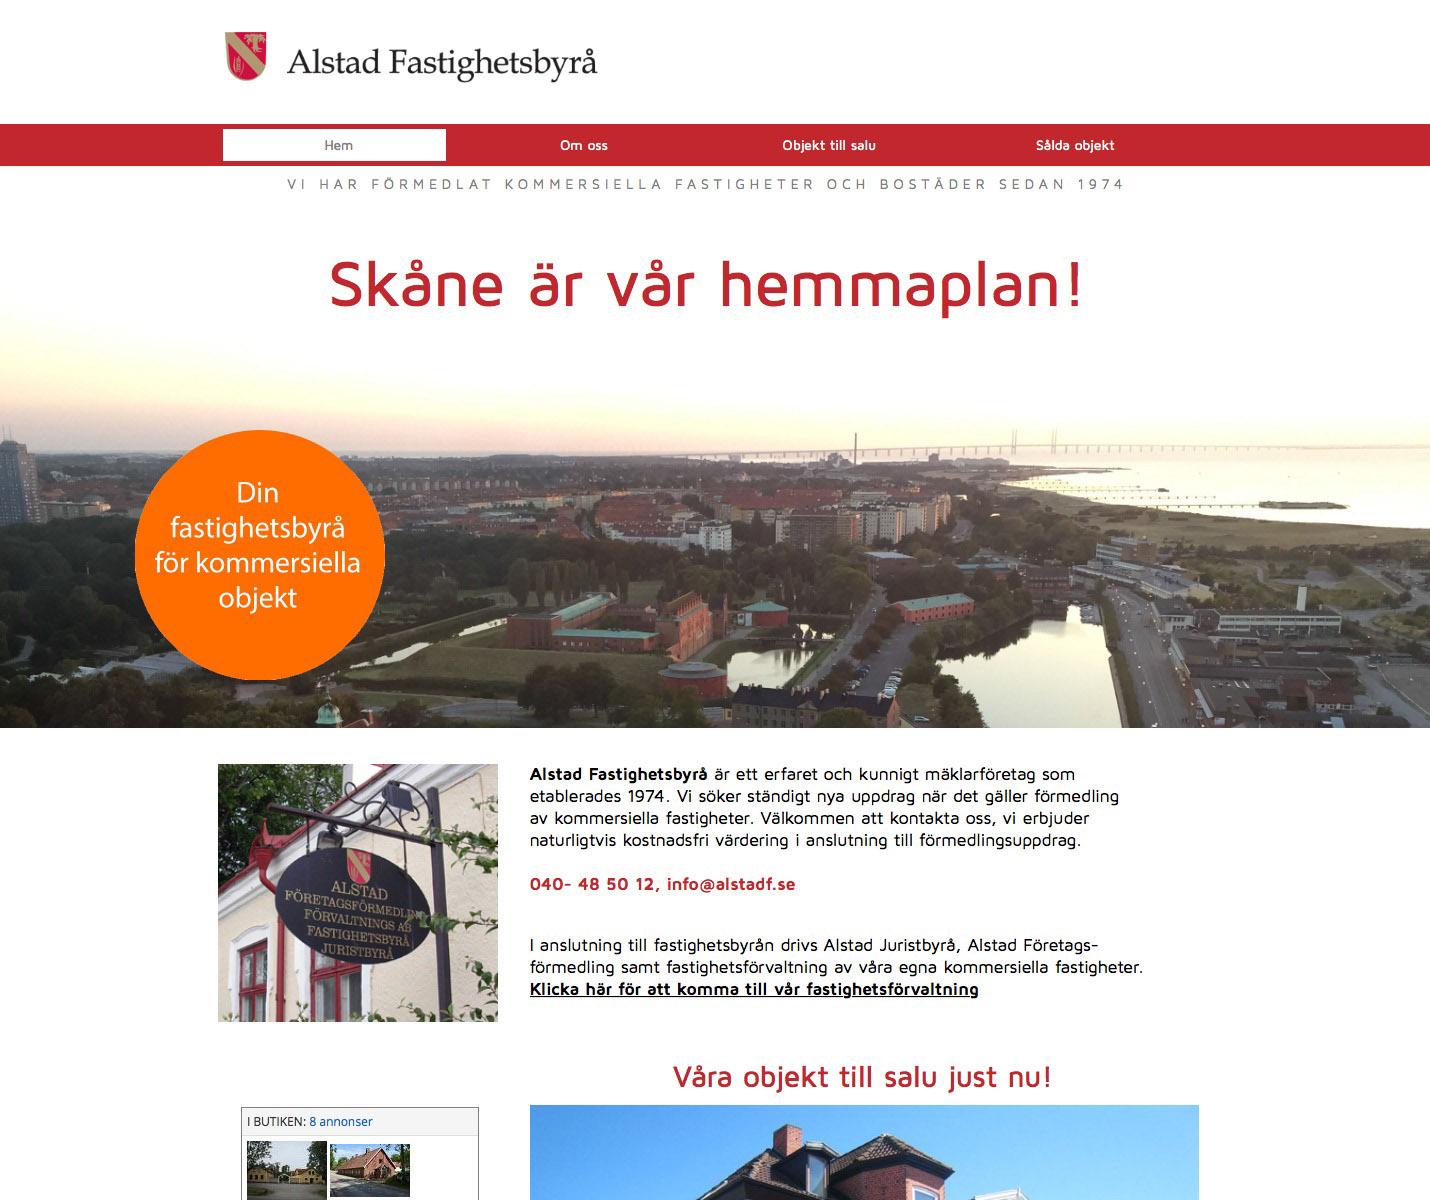 Lediga jobb fr Malm Hgskola i Alstad | unam.net